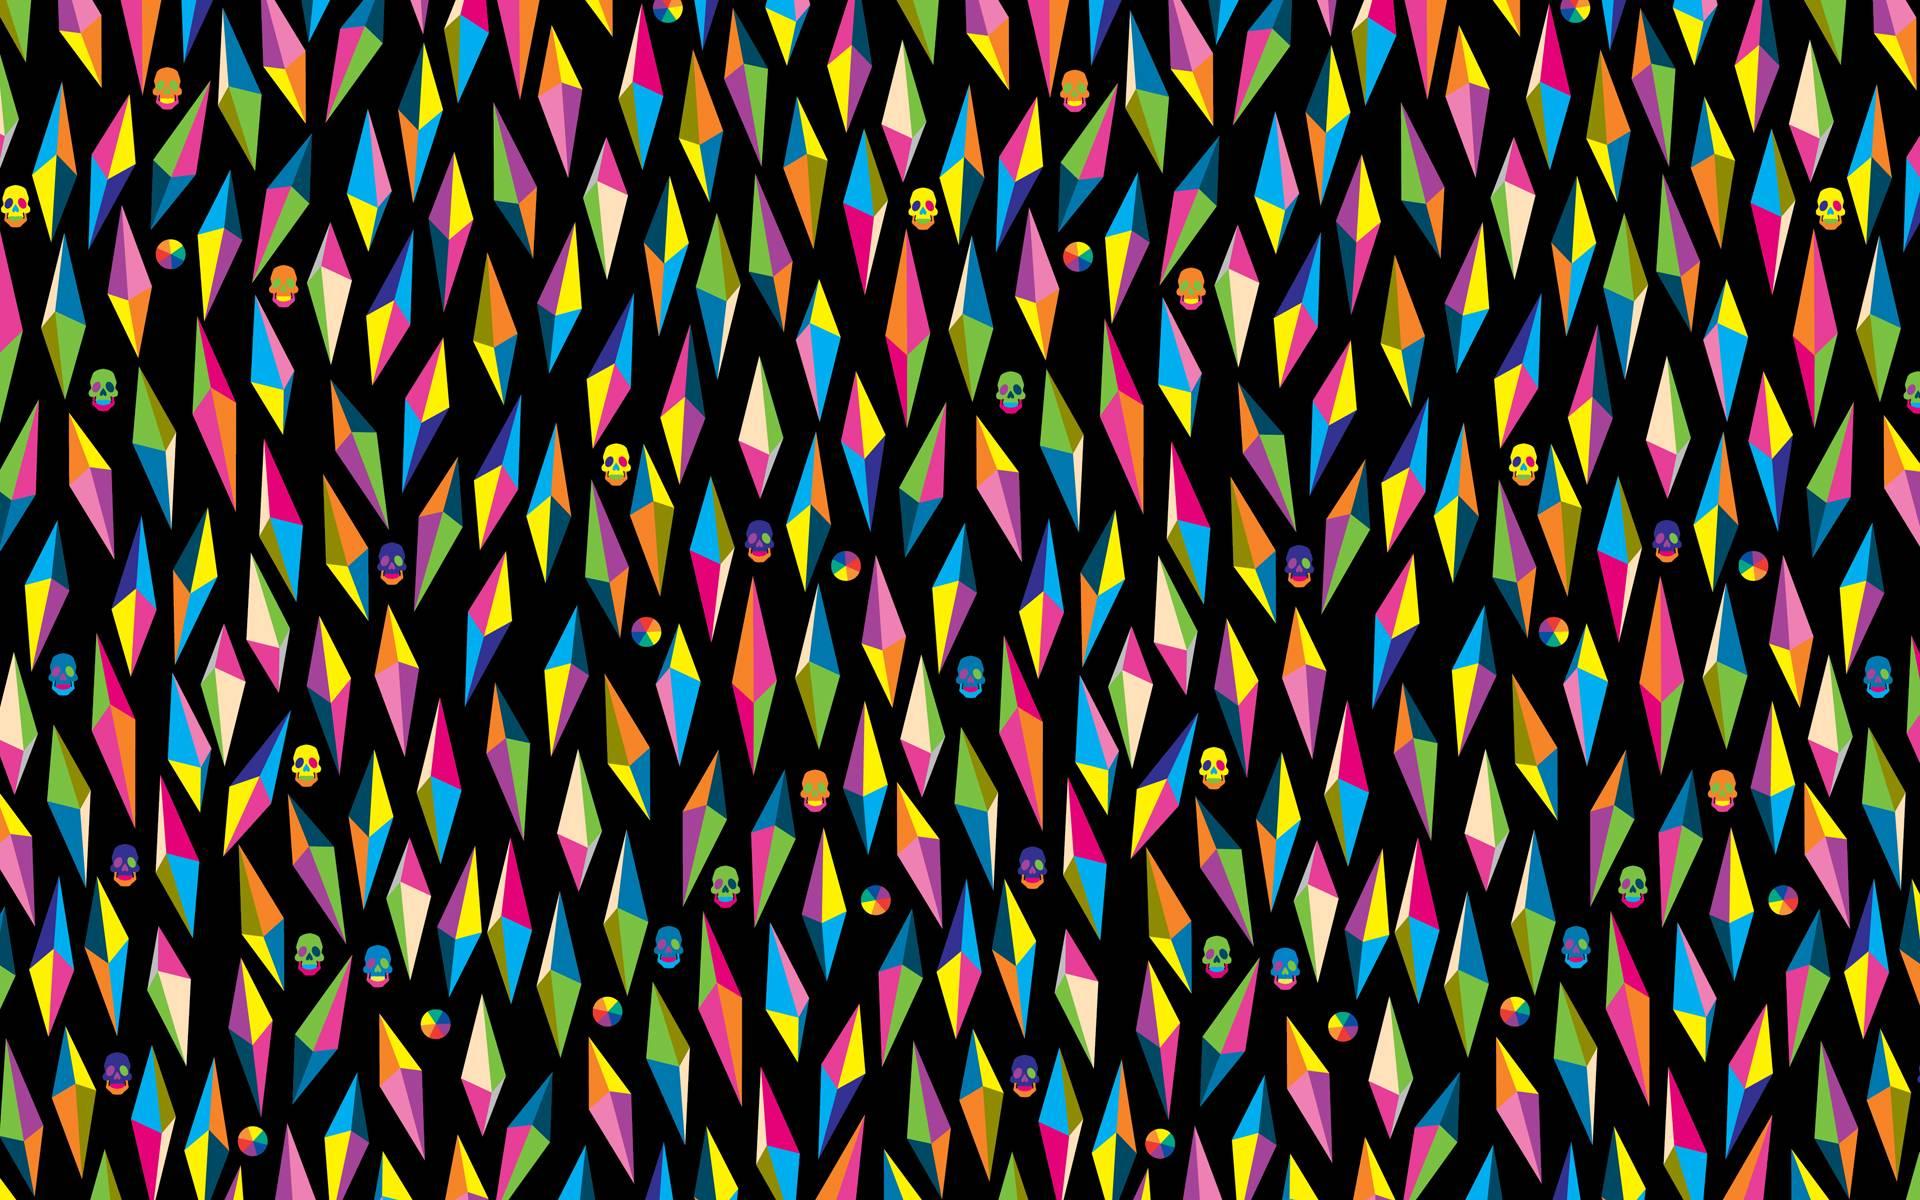 Artsy Desktop Wallpapers - Wallpaper Cave